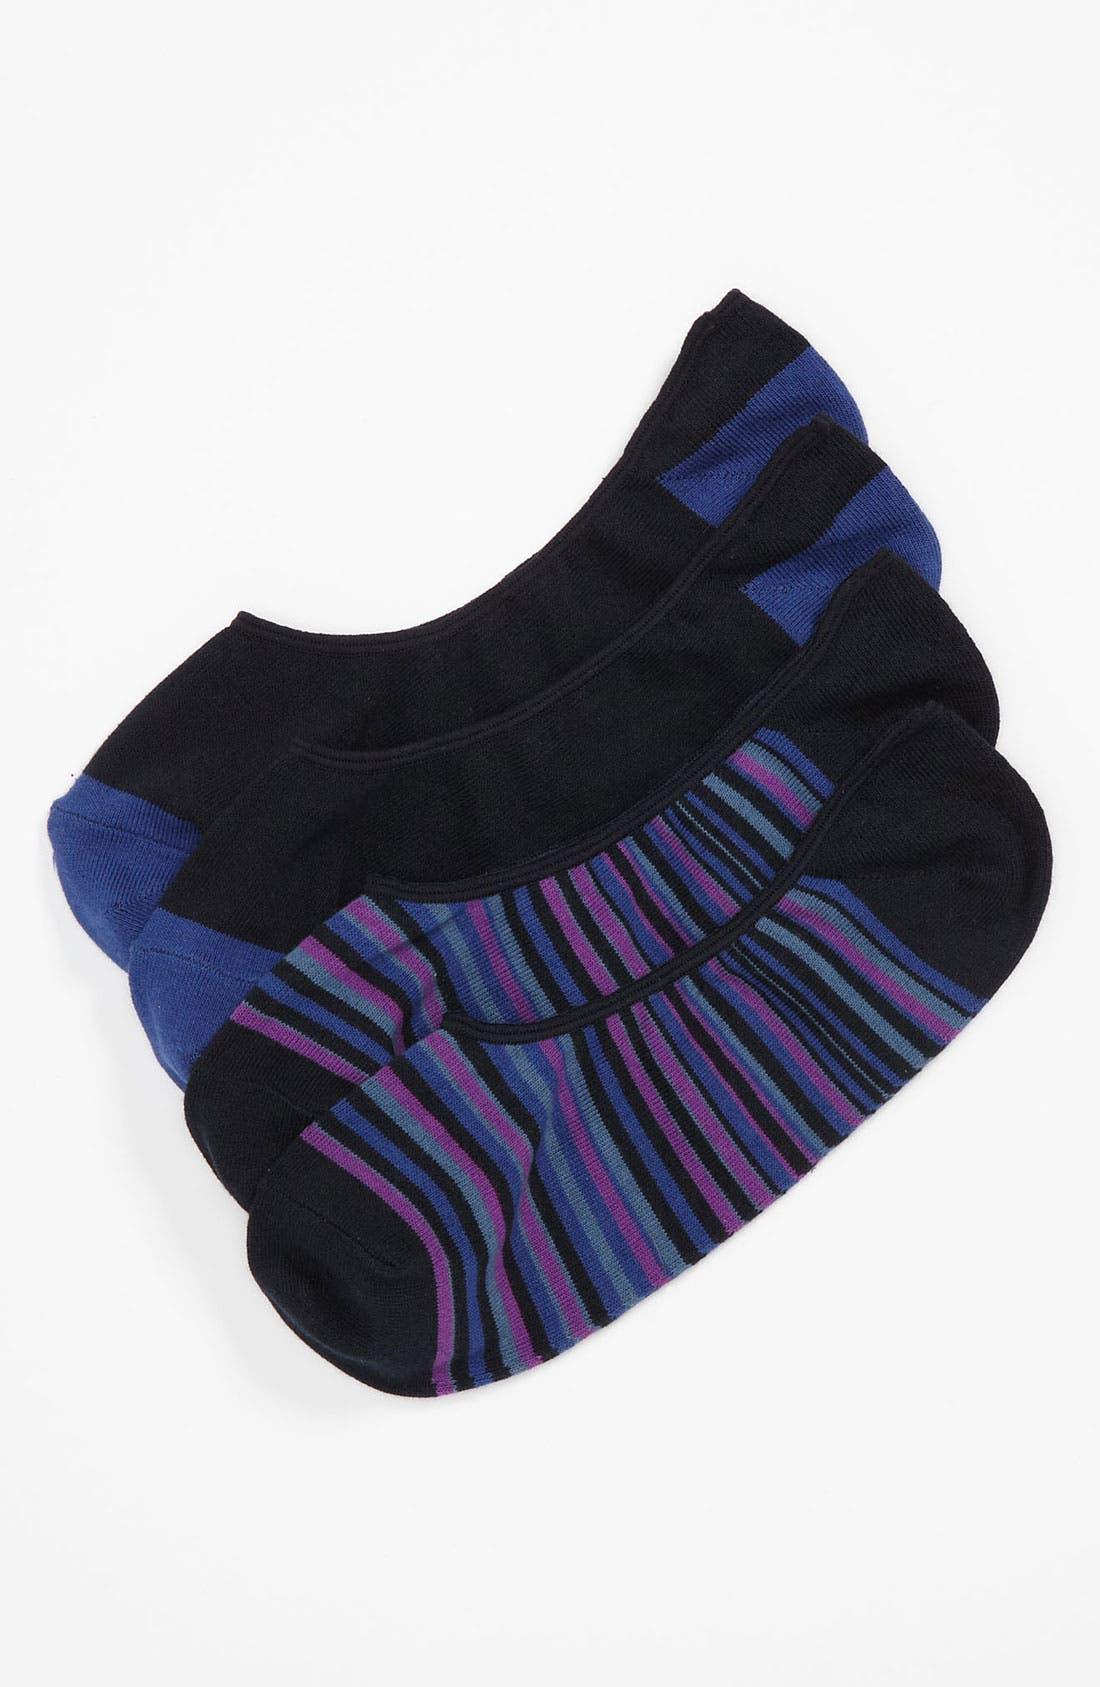 Alternate Image 1 Selected - Cole Haan 'Town Stripe' Liner Socks